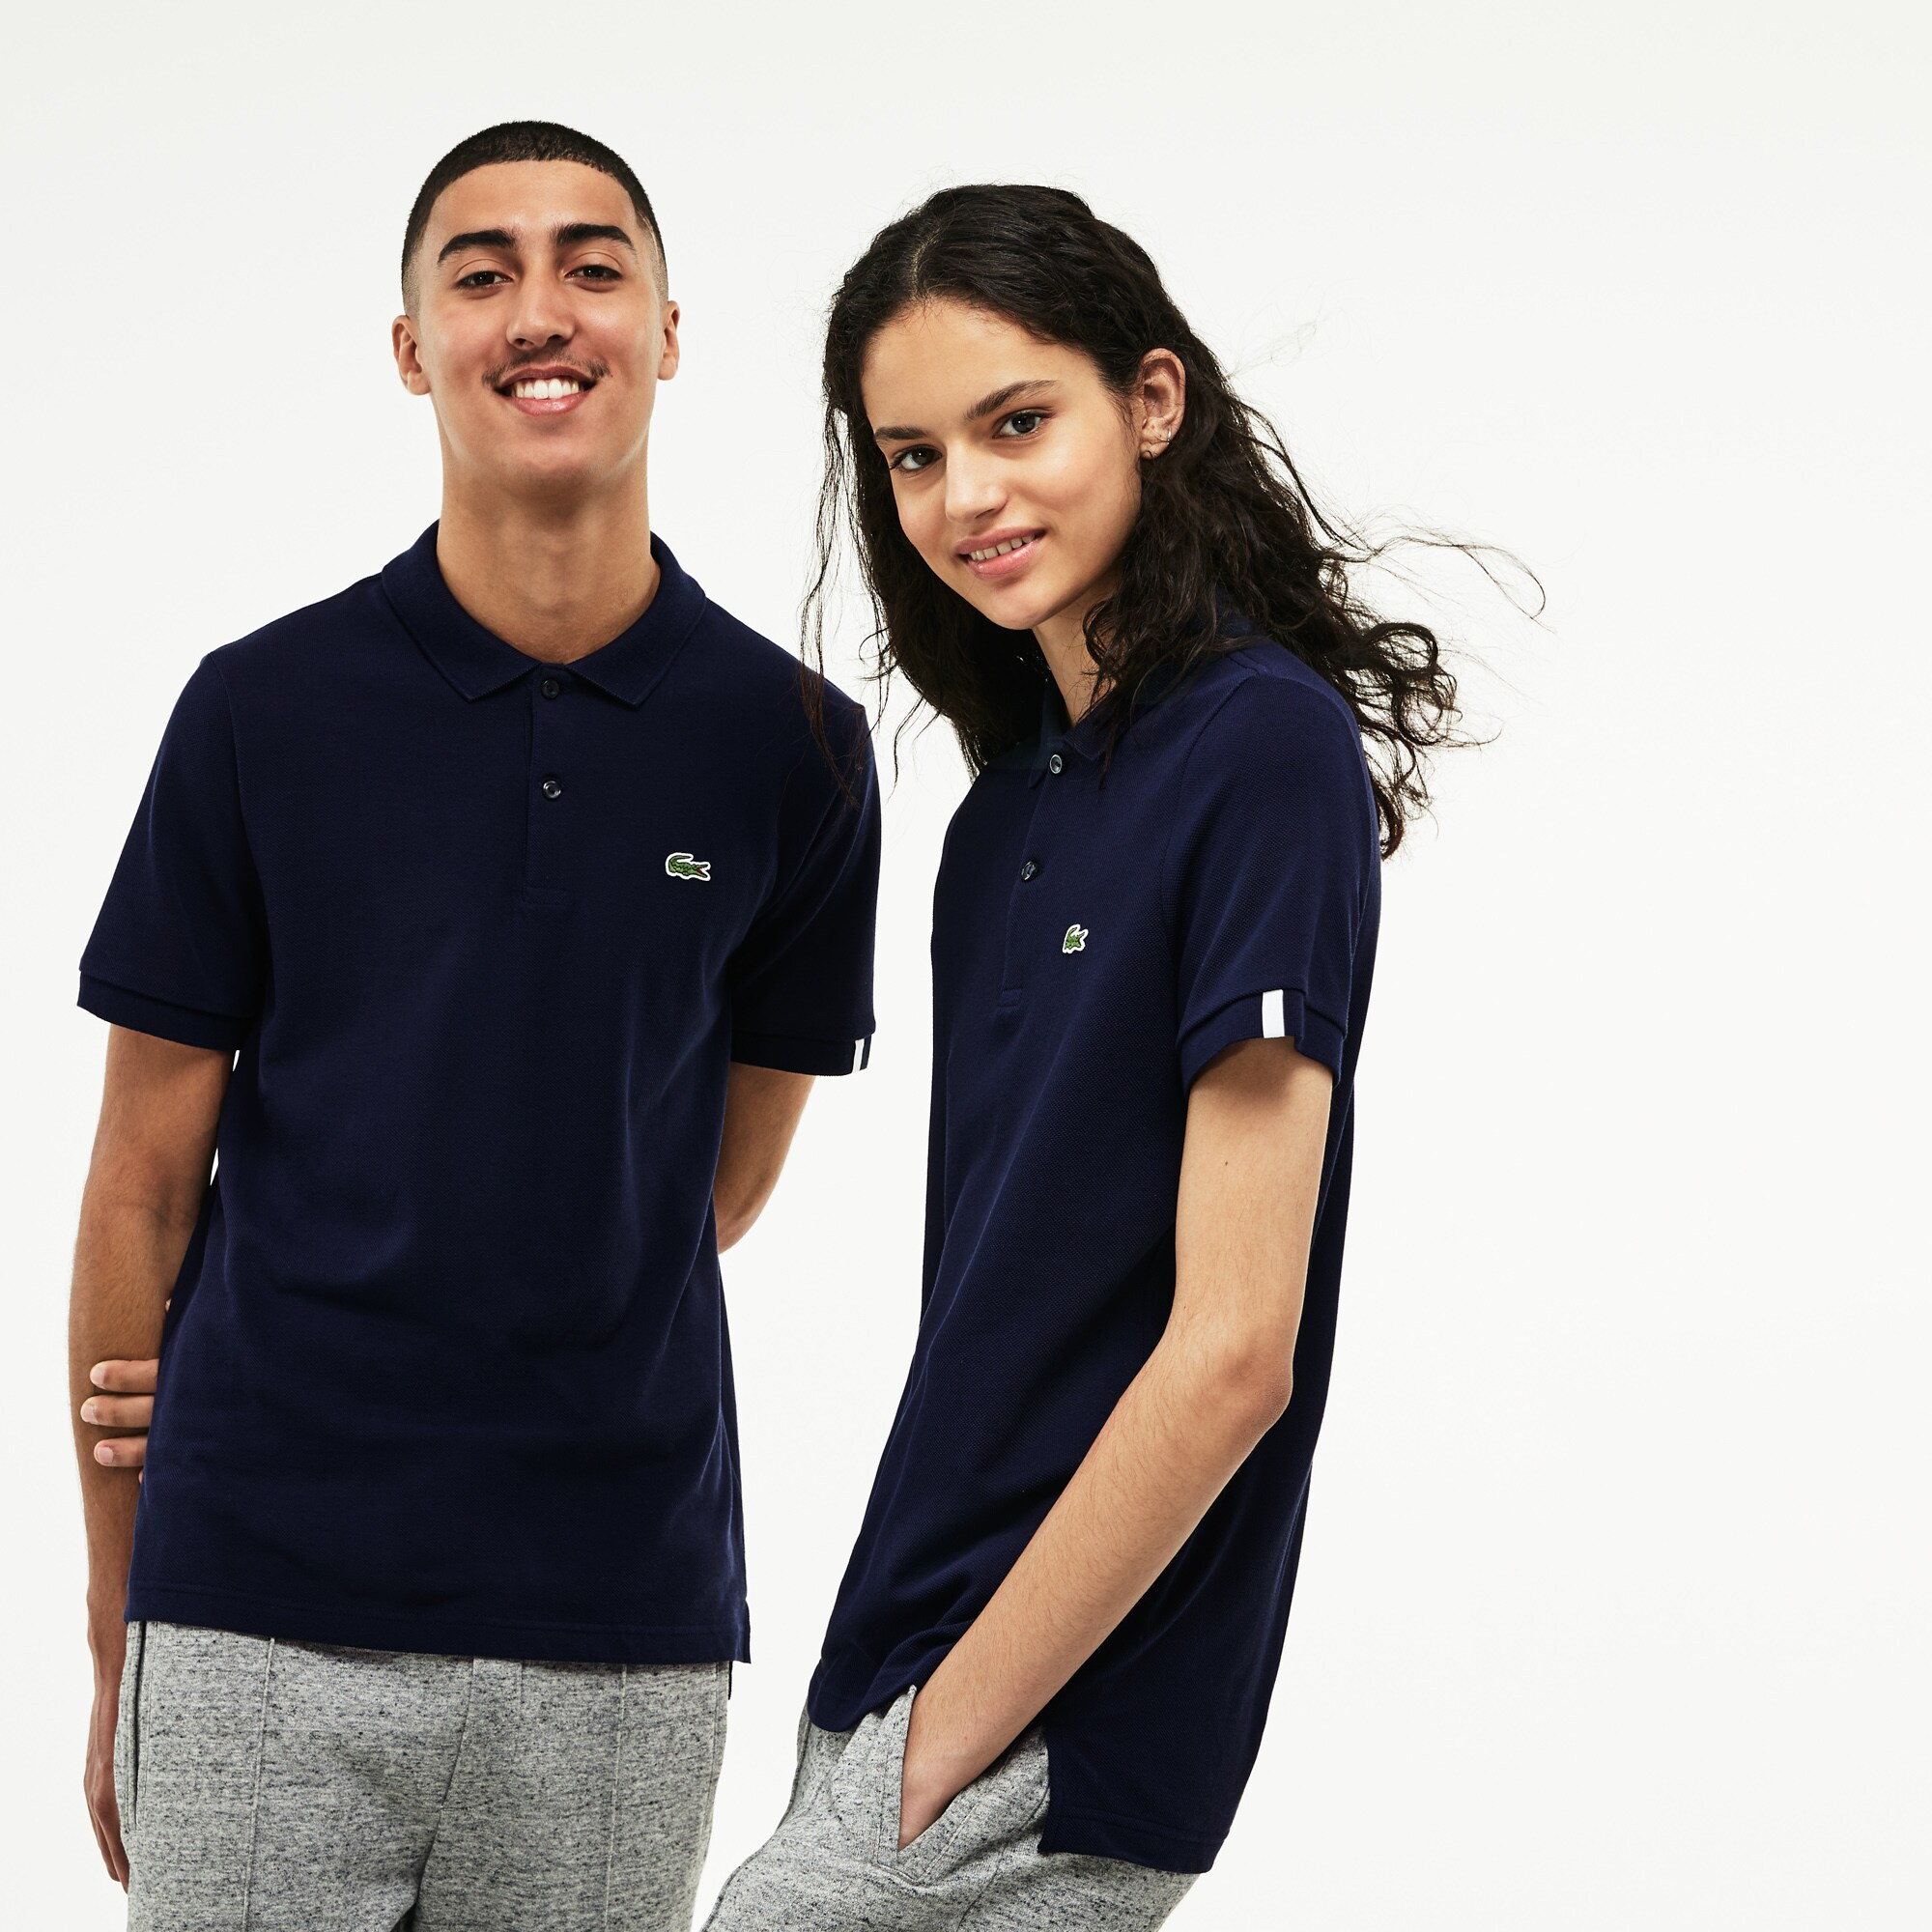 Camisas polo para mulheres  manga longa e sem manga   LACOSTE bda36b77c5